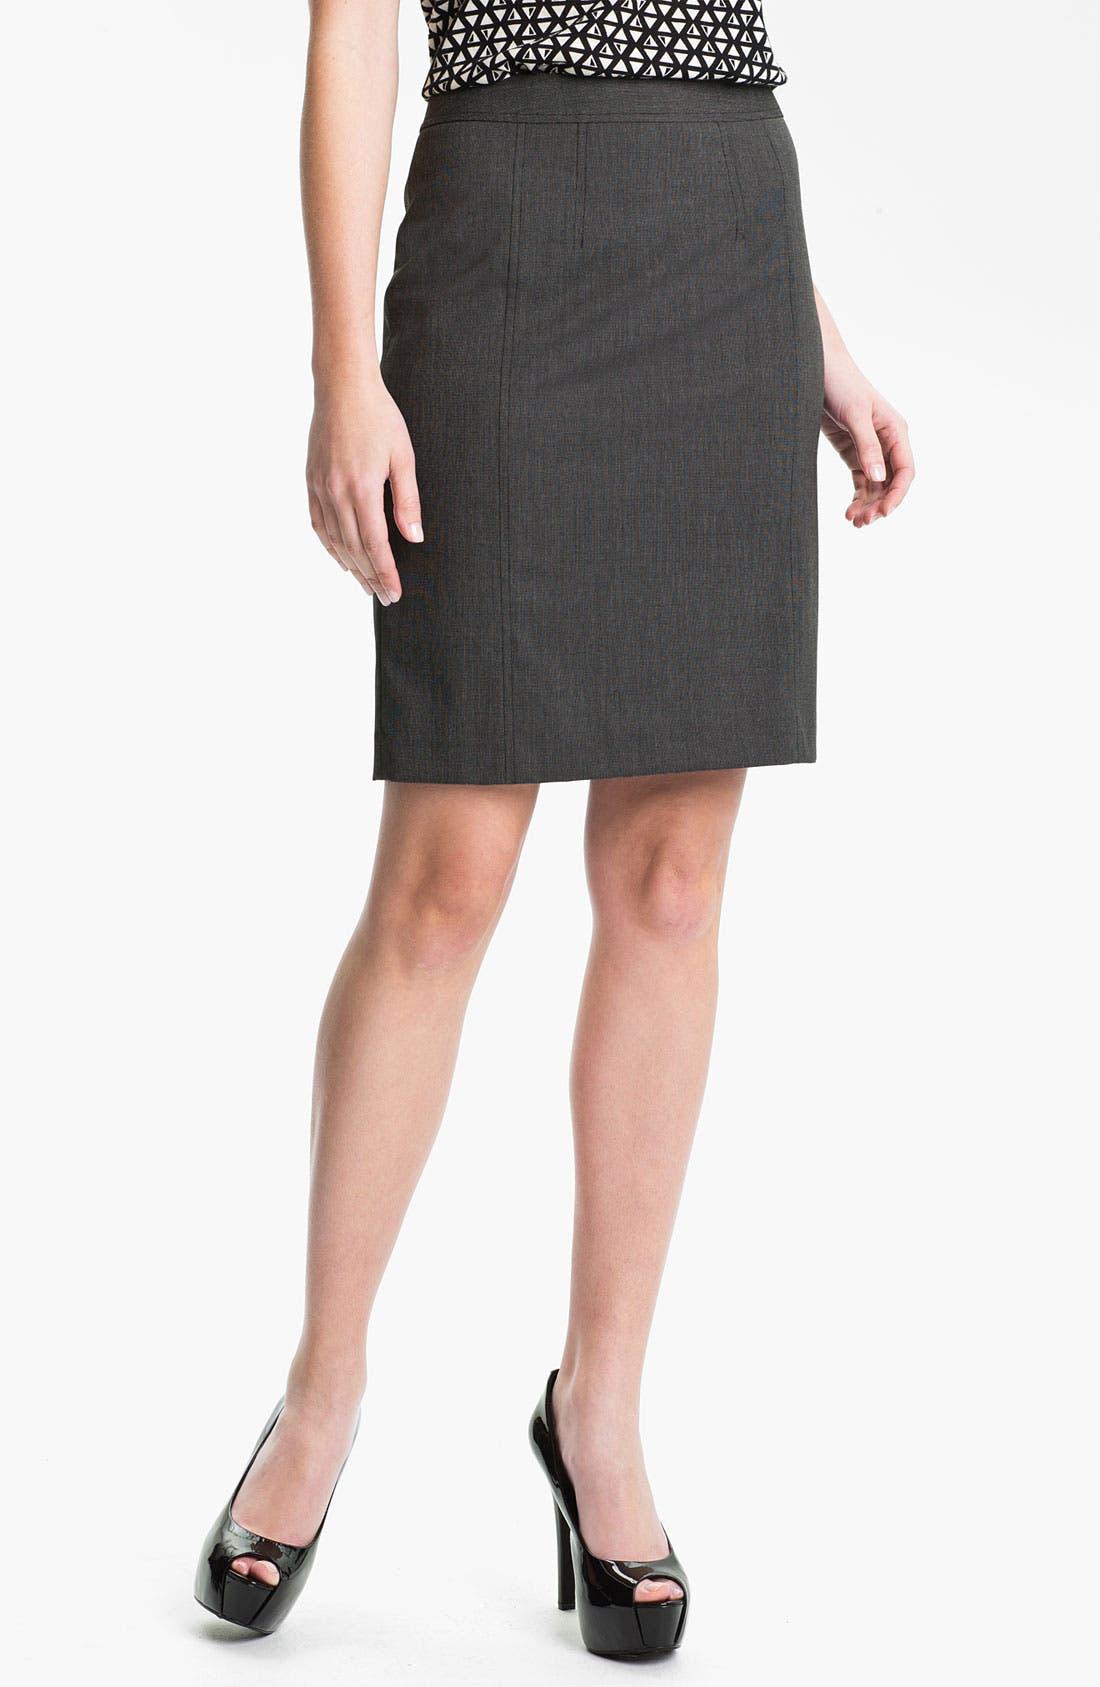 Alternate Image 1 Selected - Halogen® 'End on End' Skirt (Petite)